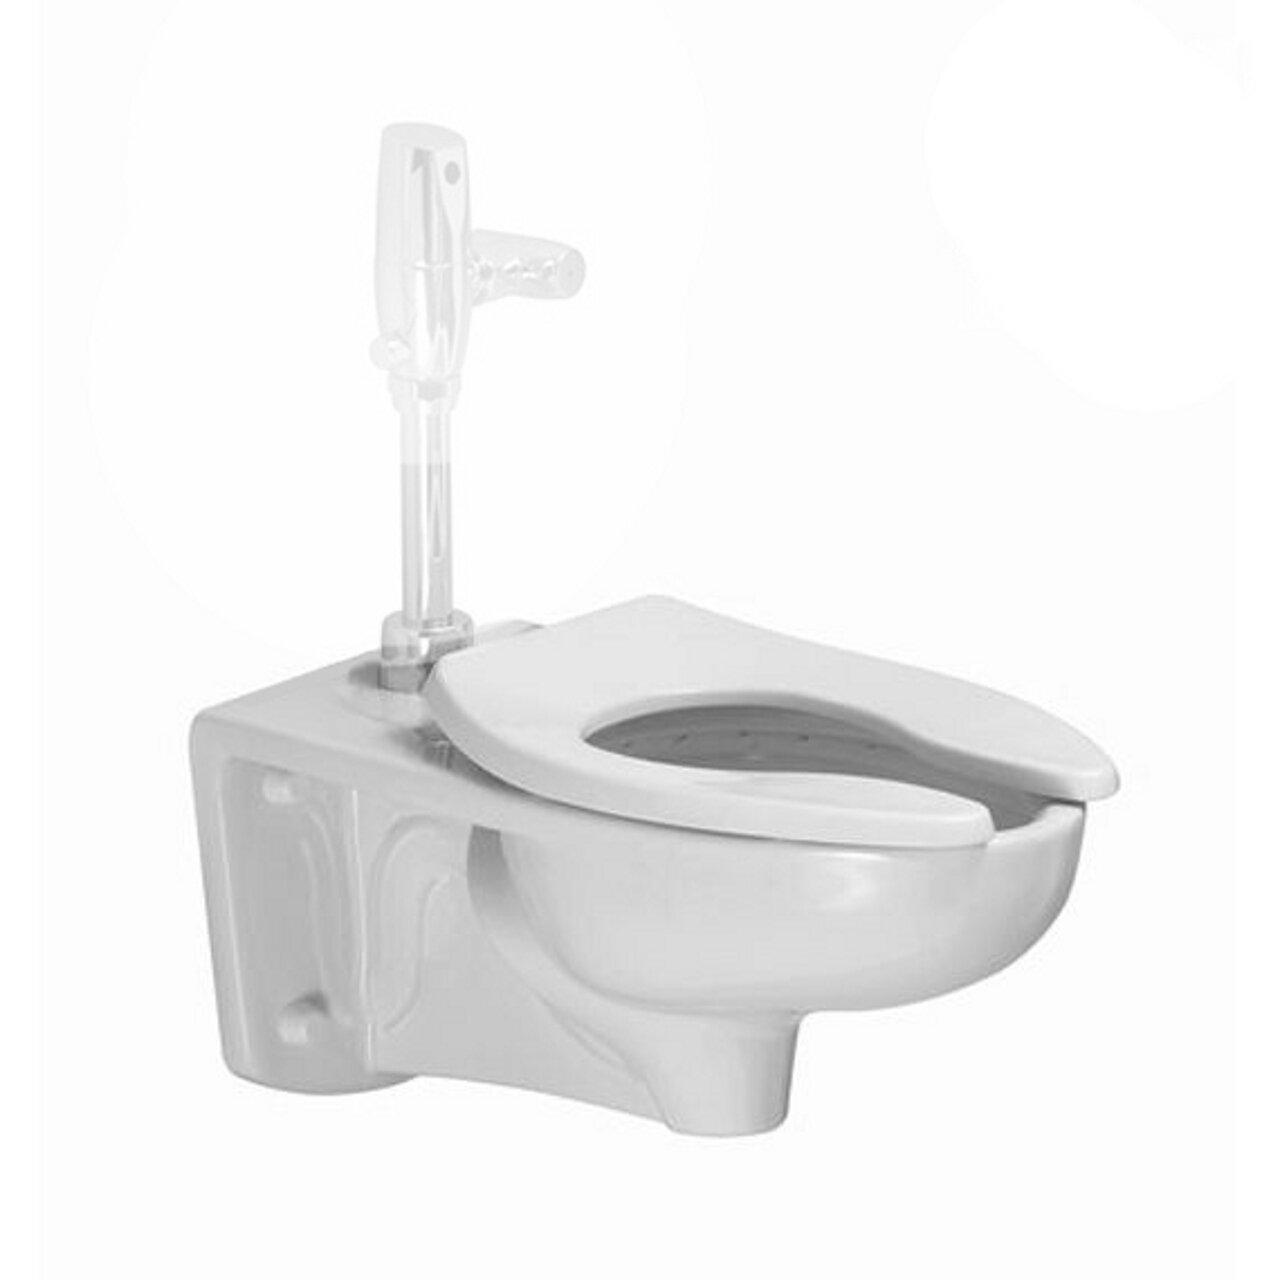 American Standard 2294011EC.020 Afwall ADA Retrofit Universal Bowl with EverClean, White